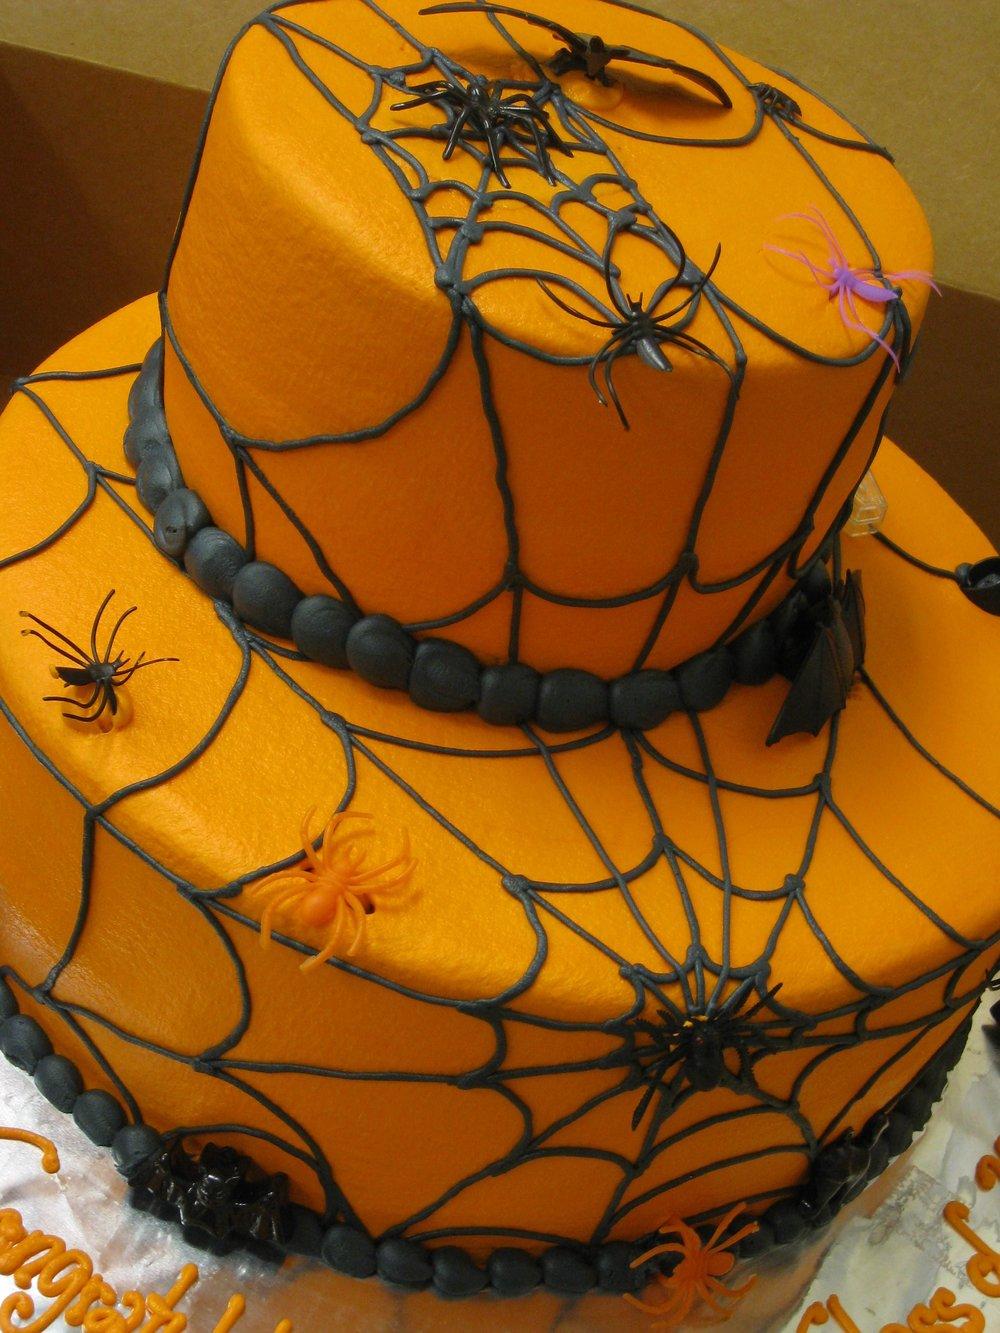 Fantasy Cakes Halloween Special 1.JPG